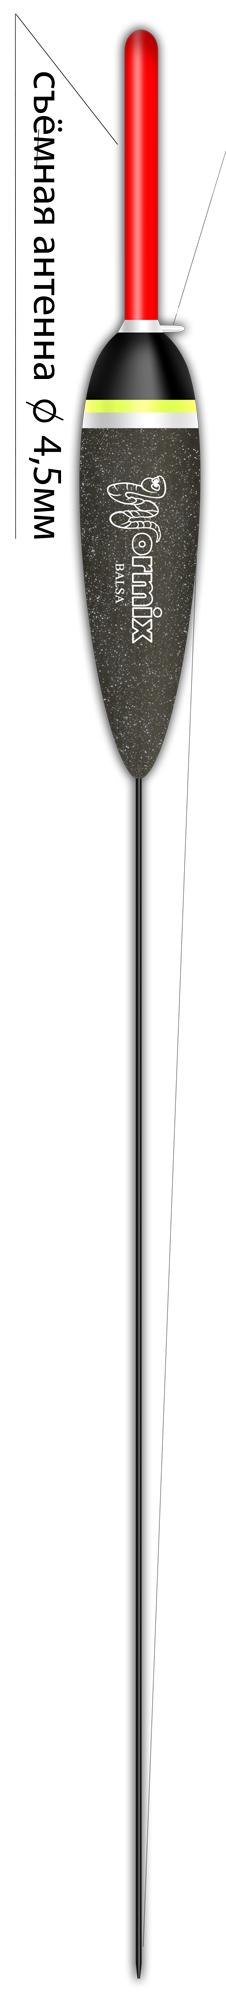 Поплавок Wormix 211 - 2.5 гр под светлячок